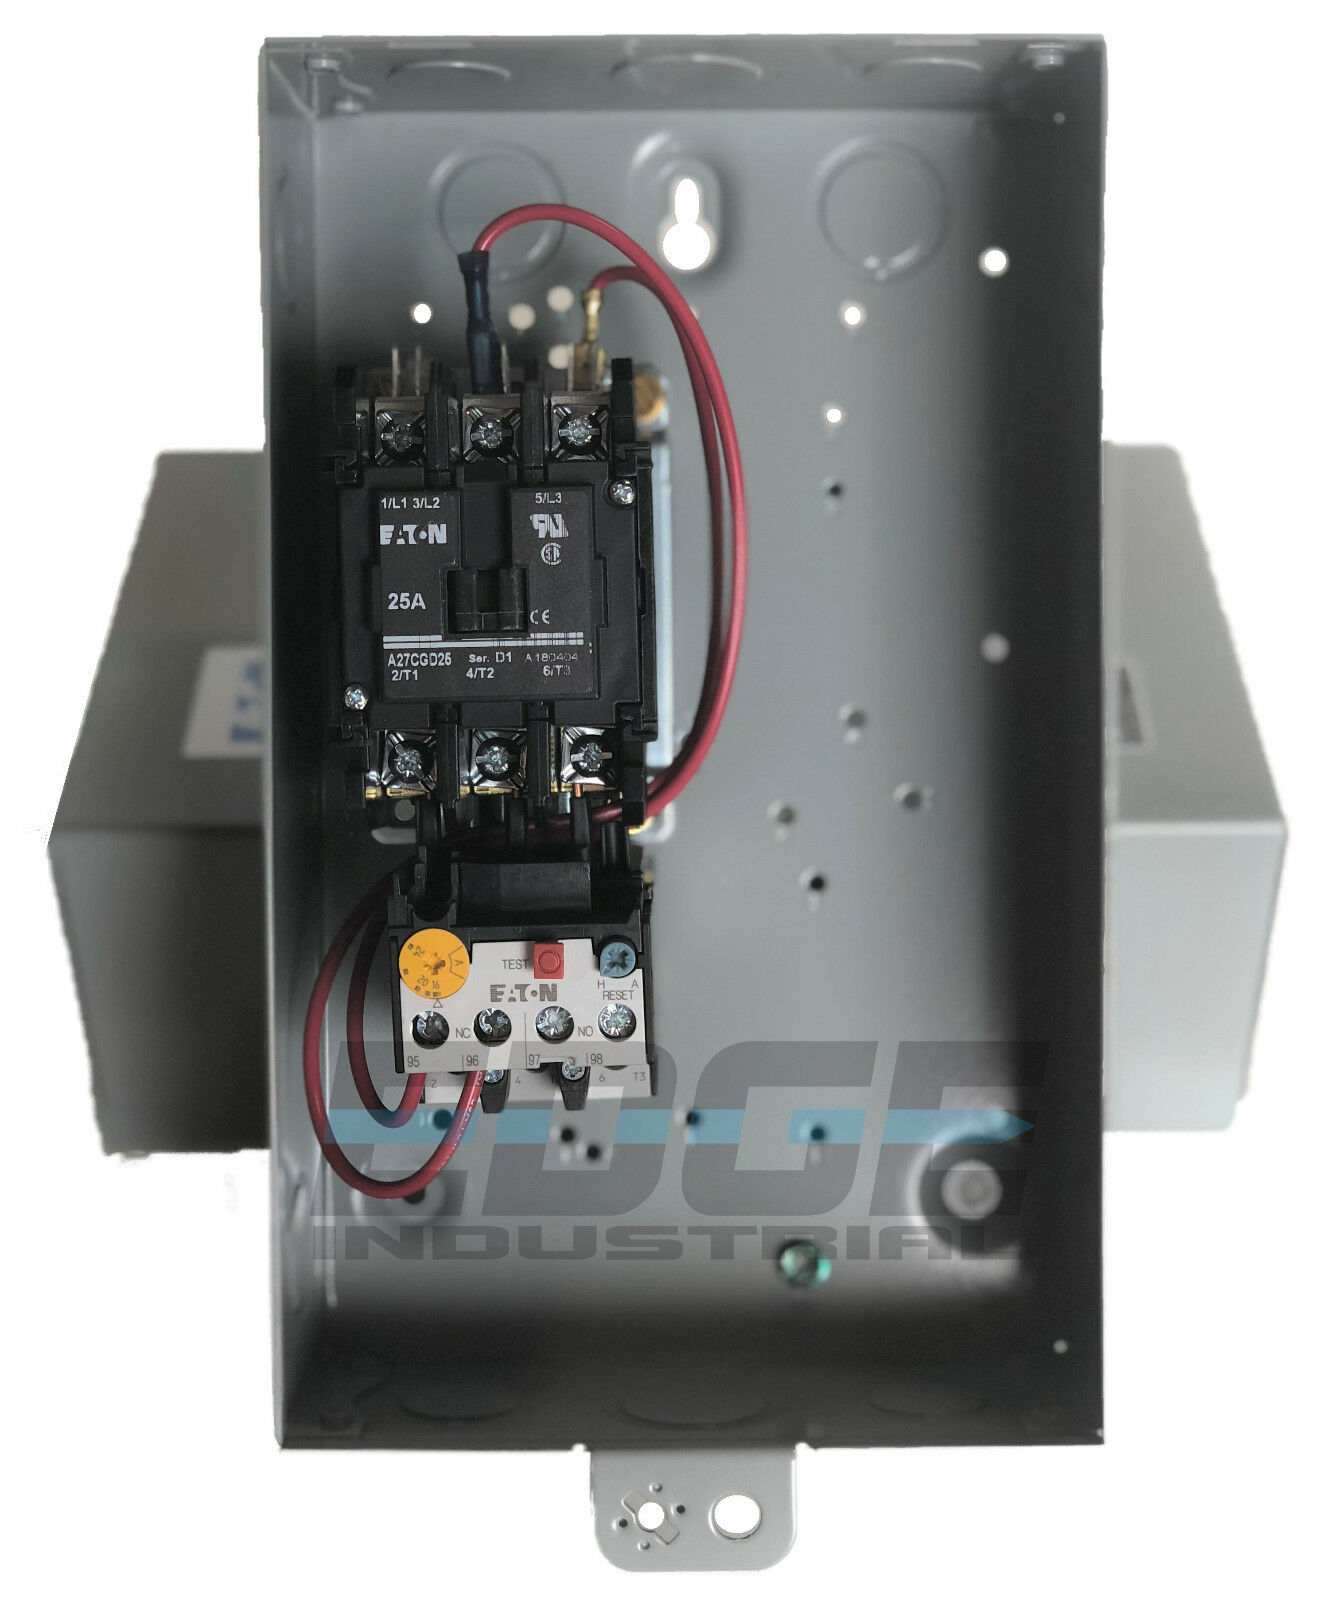 A27CGD25C016 Eaton//Cutler Hammer DP Starter 7.5HP 25 FLA 208//230V 3ph